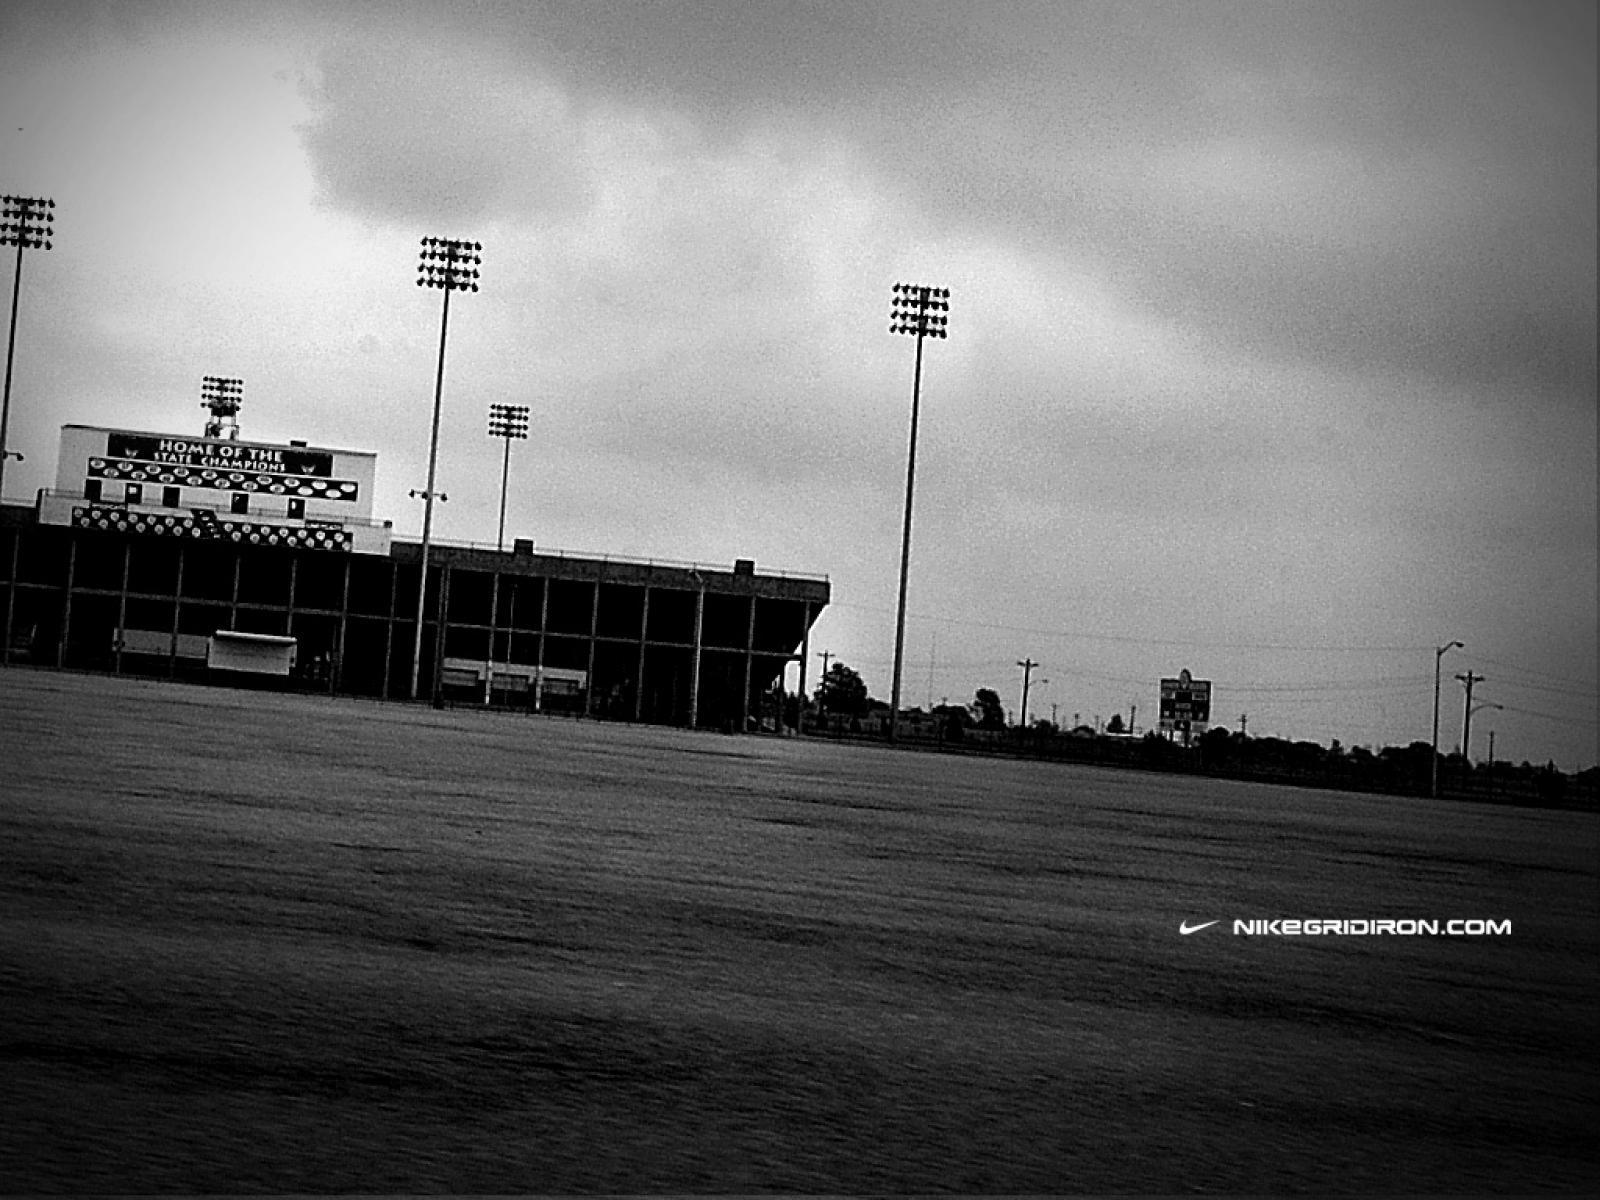 adidas american football quotes - photo #19